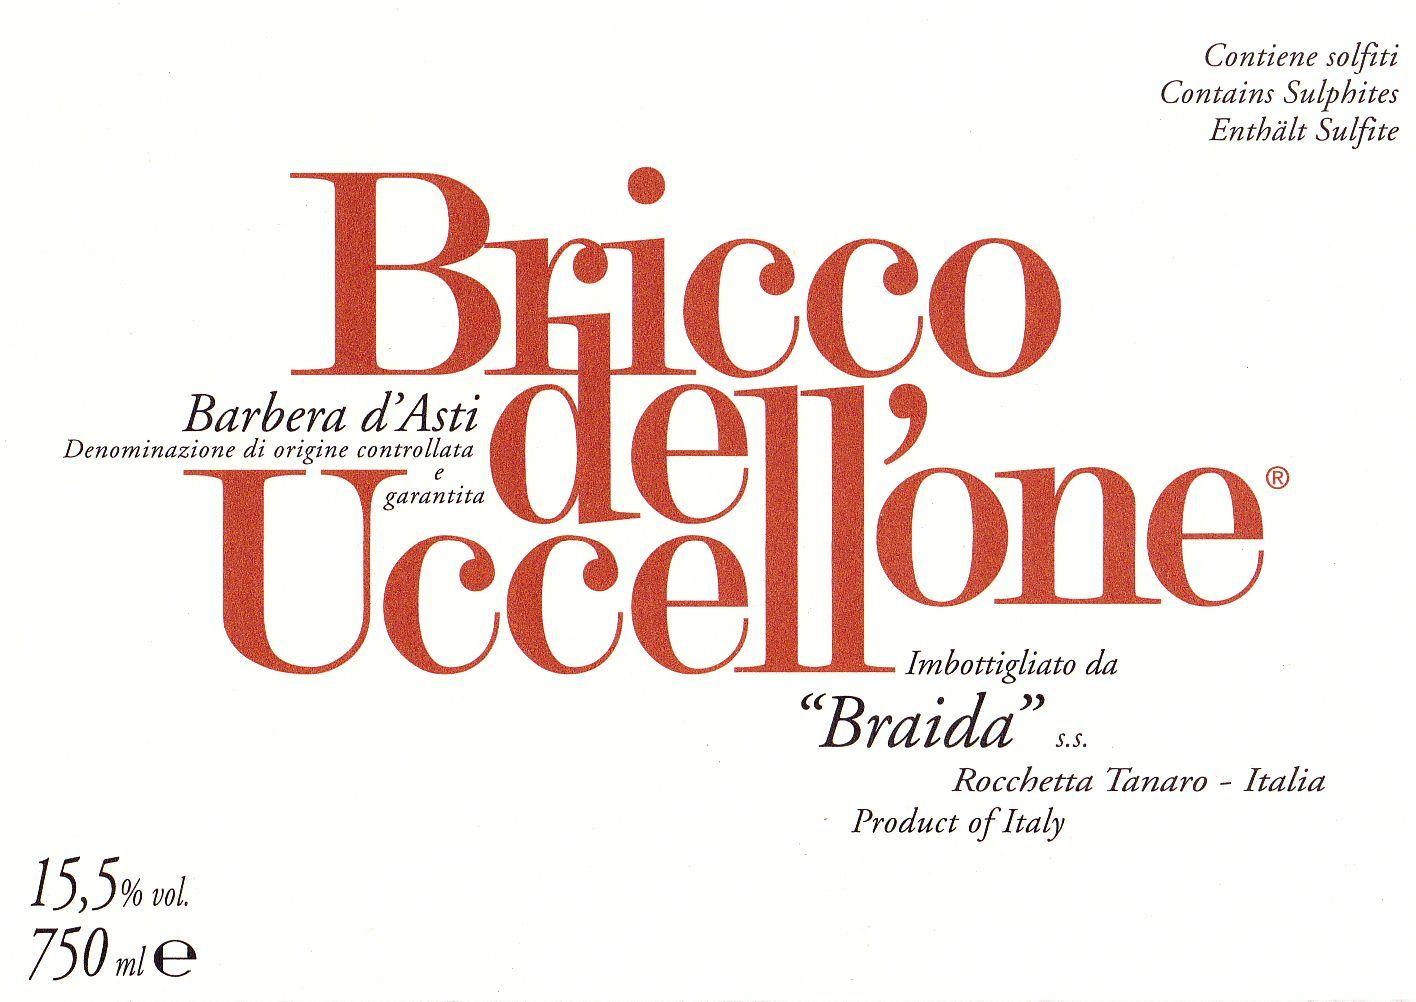 Barbera D Asti Bricco Dell Uccellone 1996 Vini Piemontesi Online Vino Piemontese Vino